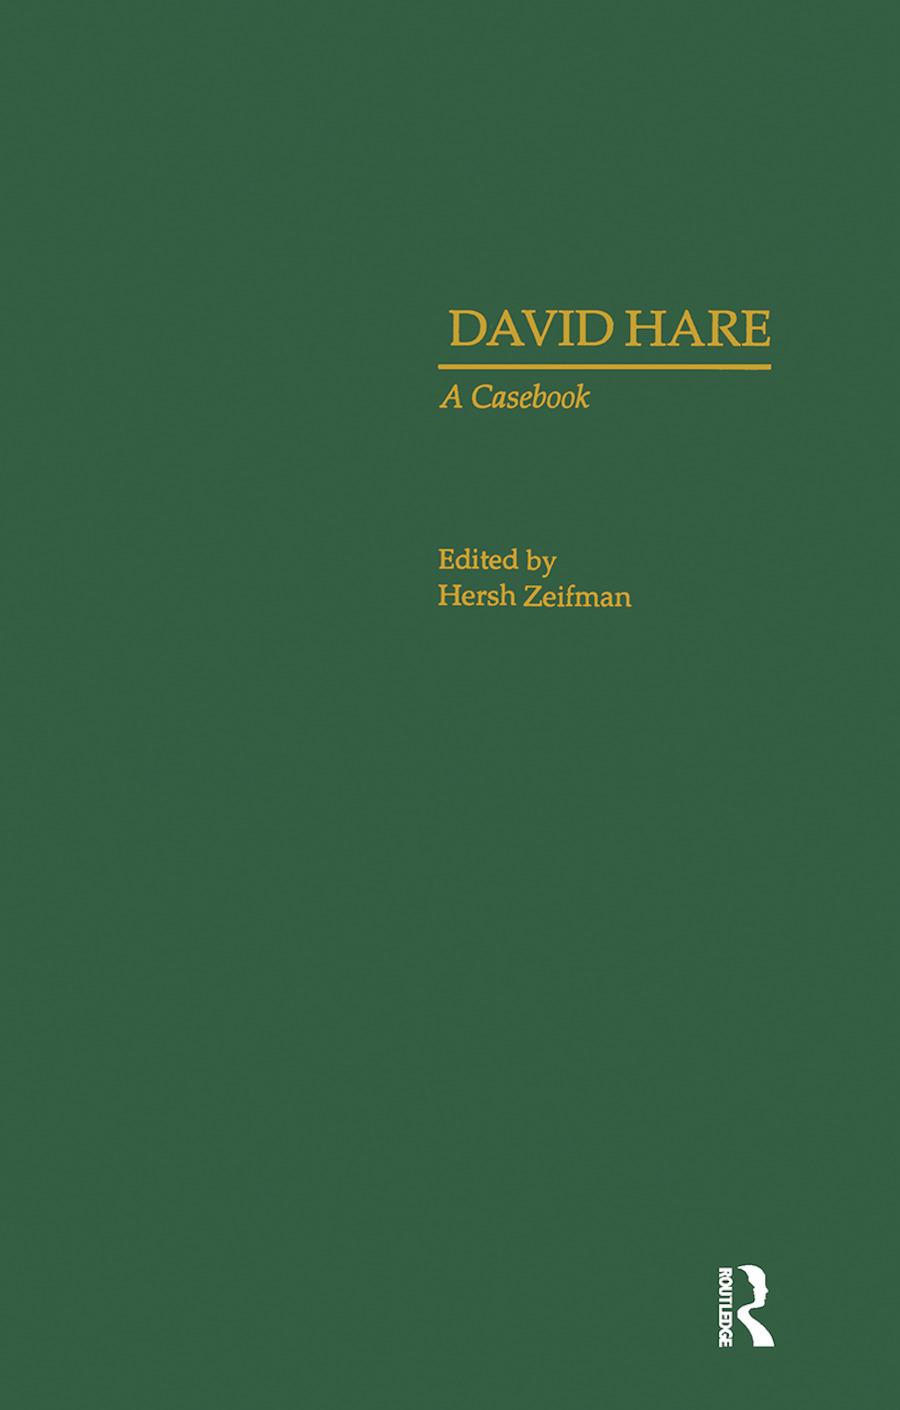 David Hare: A Casebook book cover